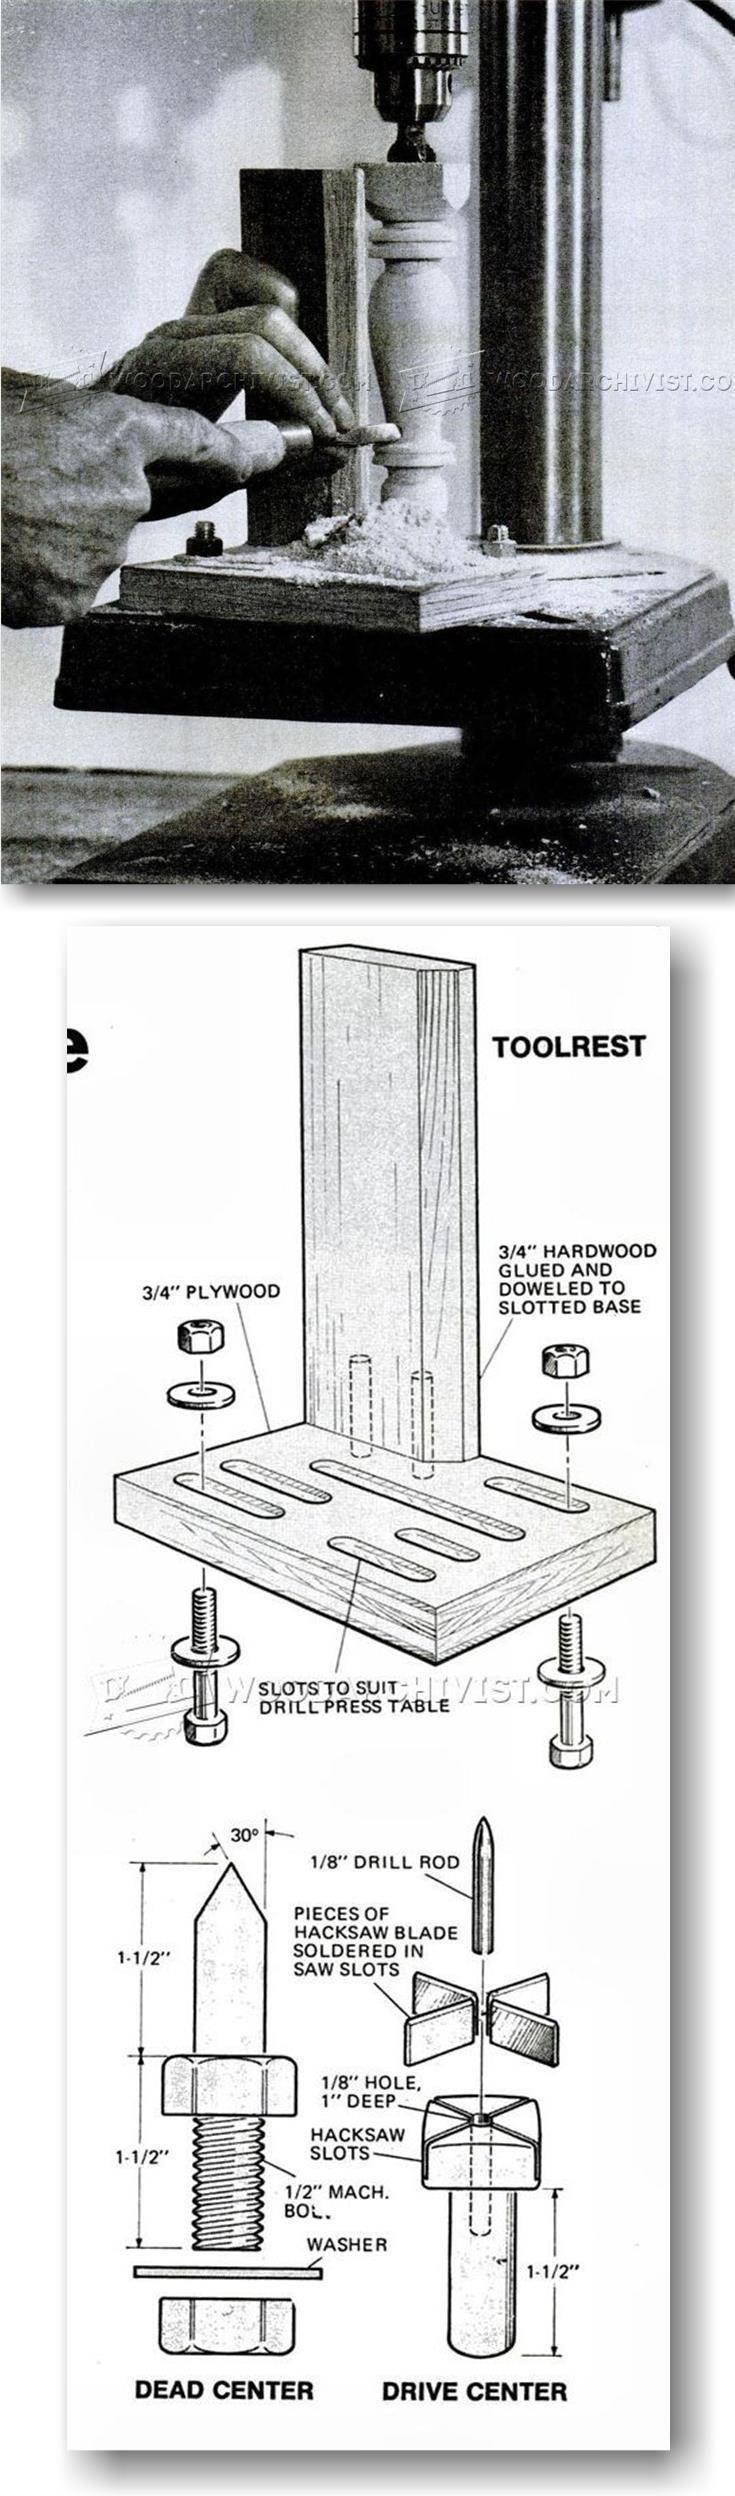 DIY Drill Press Lathe - Lathe Tips, Jigs and Fixtures   WoodArchivist.com